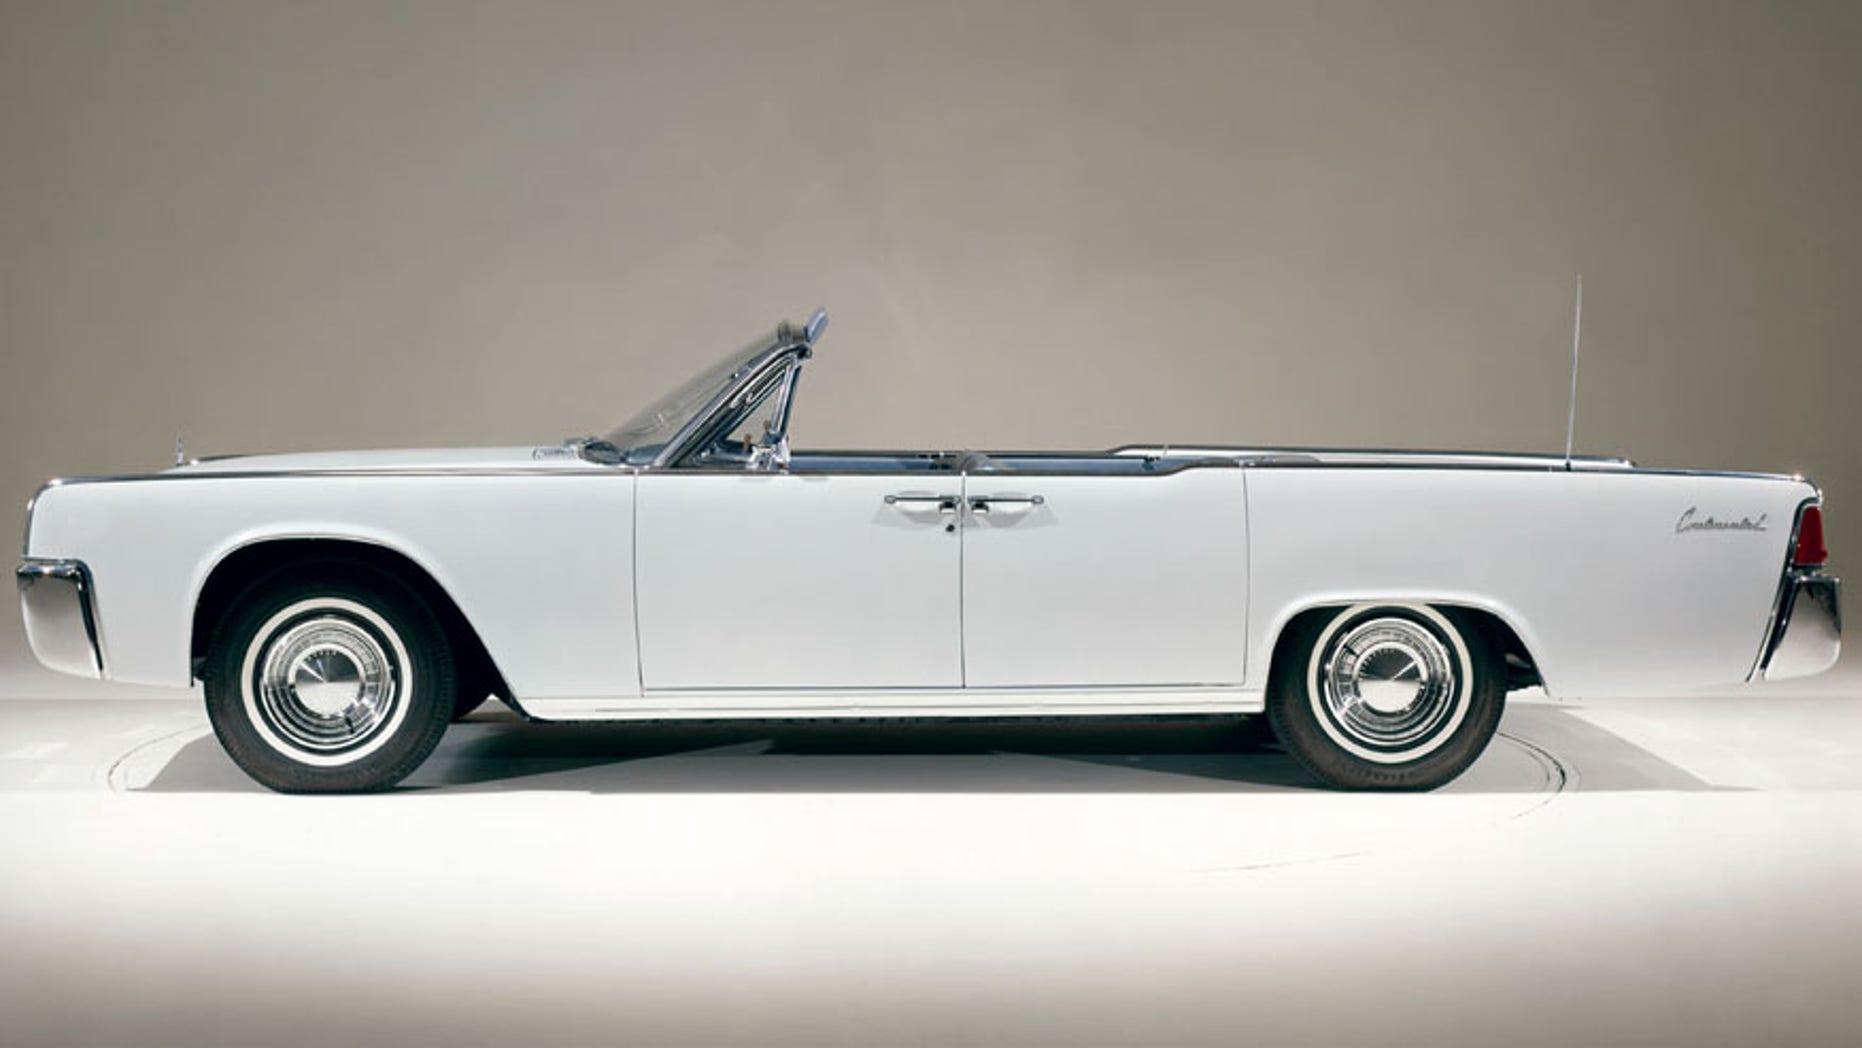 1962 Lincoln Continental Fordor Convertible